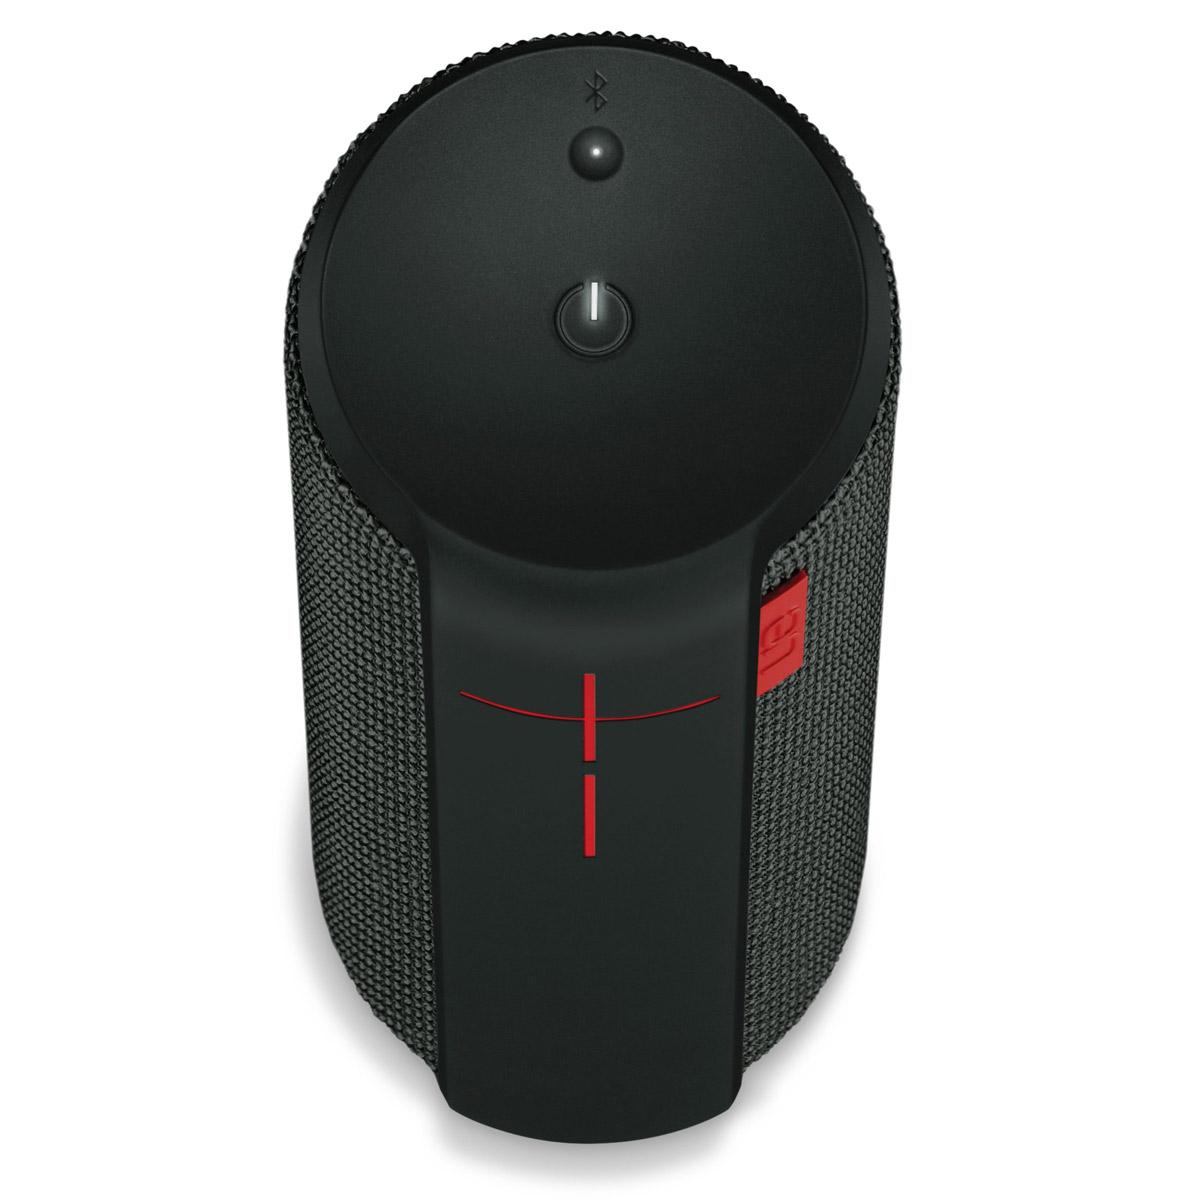 UE Boom 360 Degree Wireless Bluetooth Speaker The